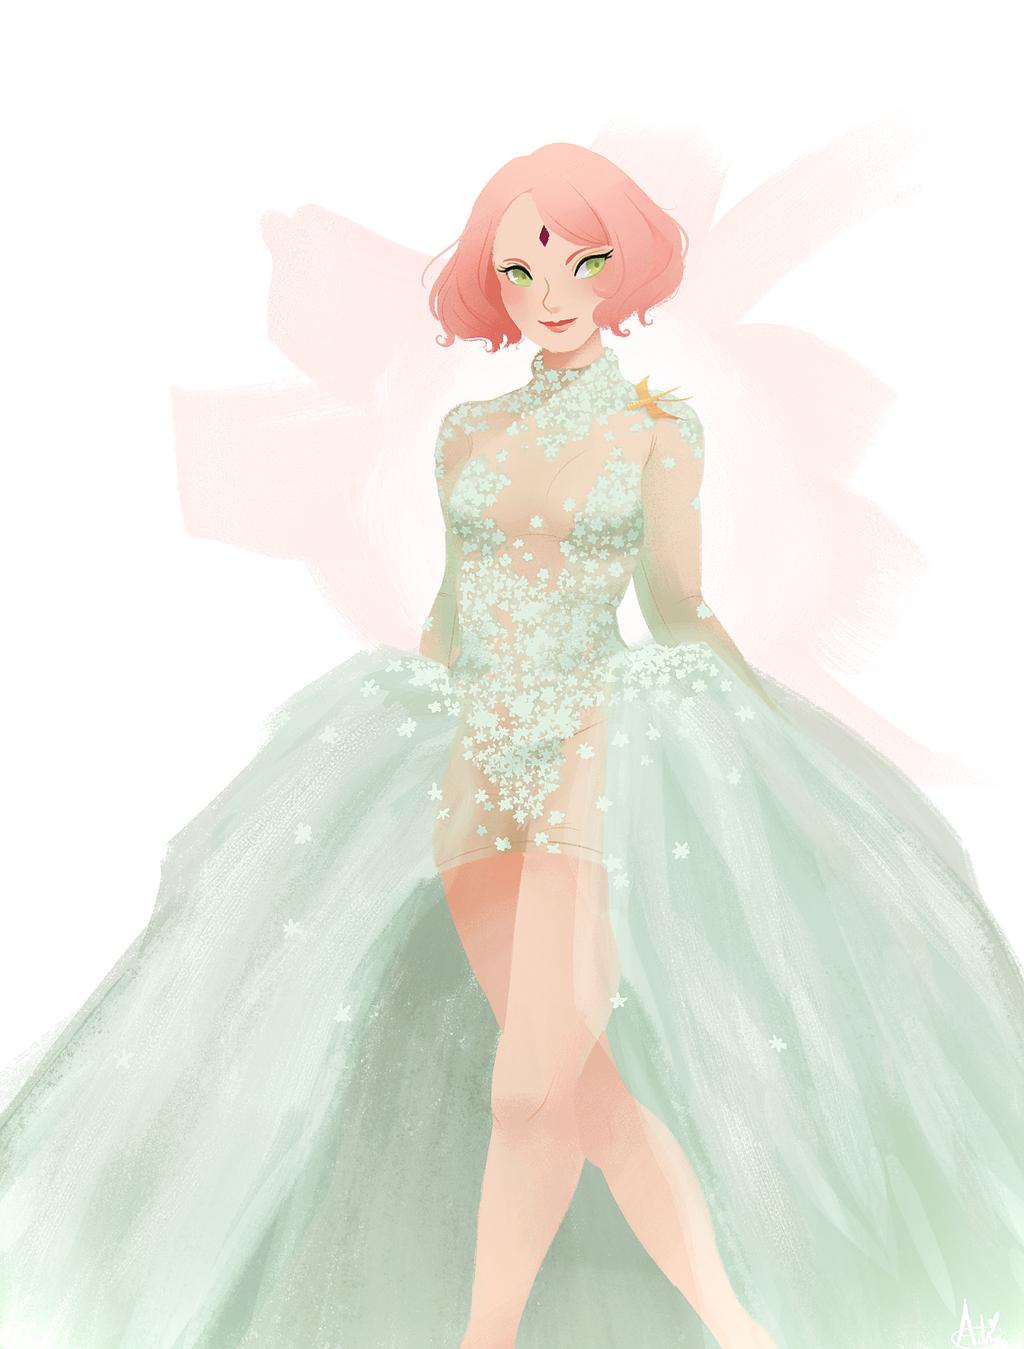 Sakura spring couture by oa chi on deviantart for Full body wedding dress